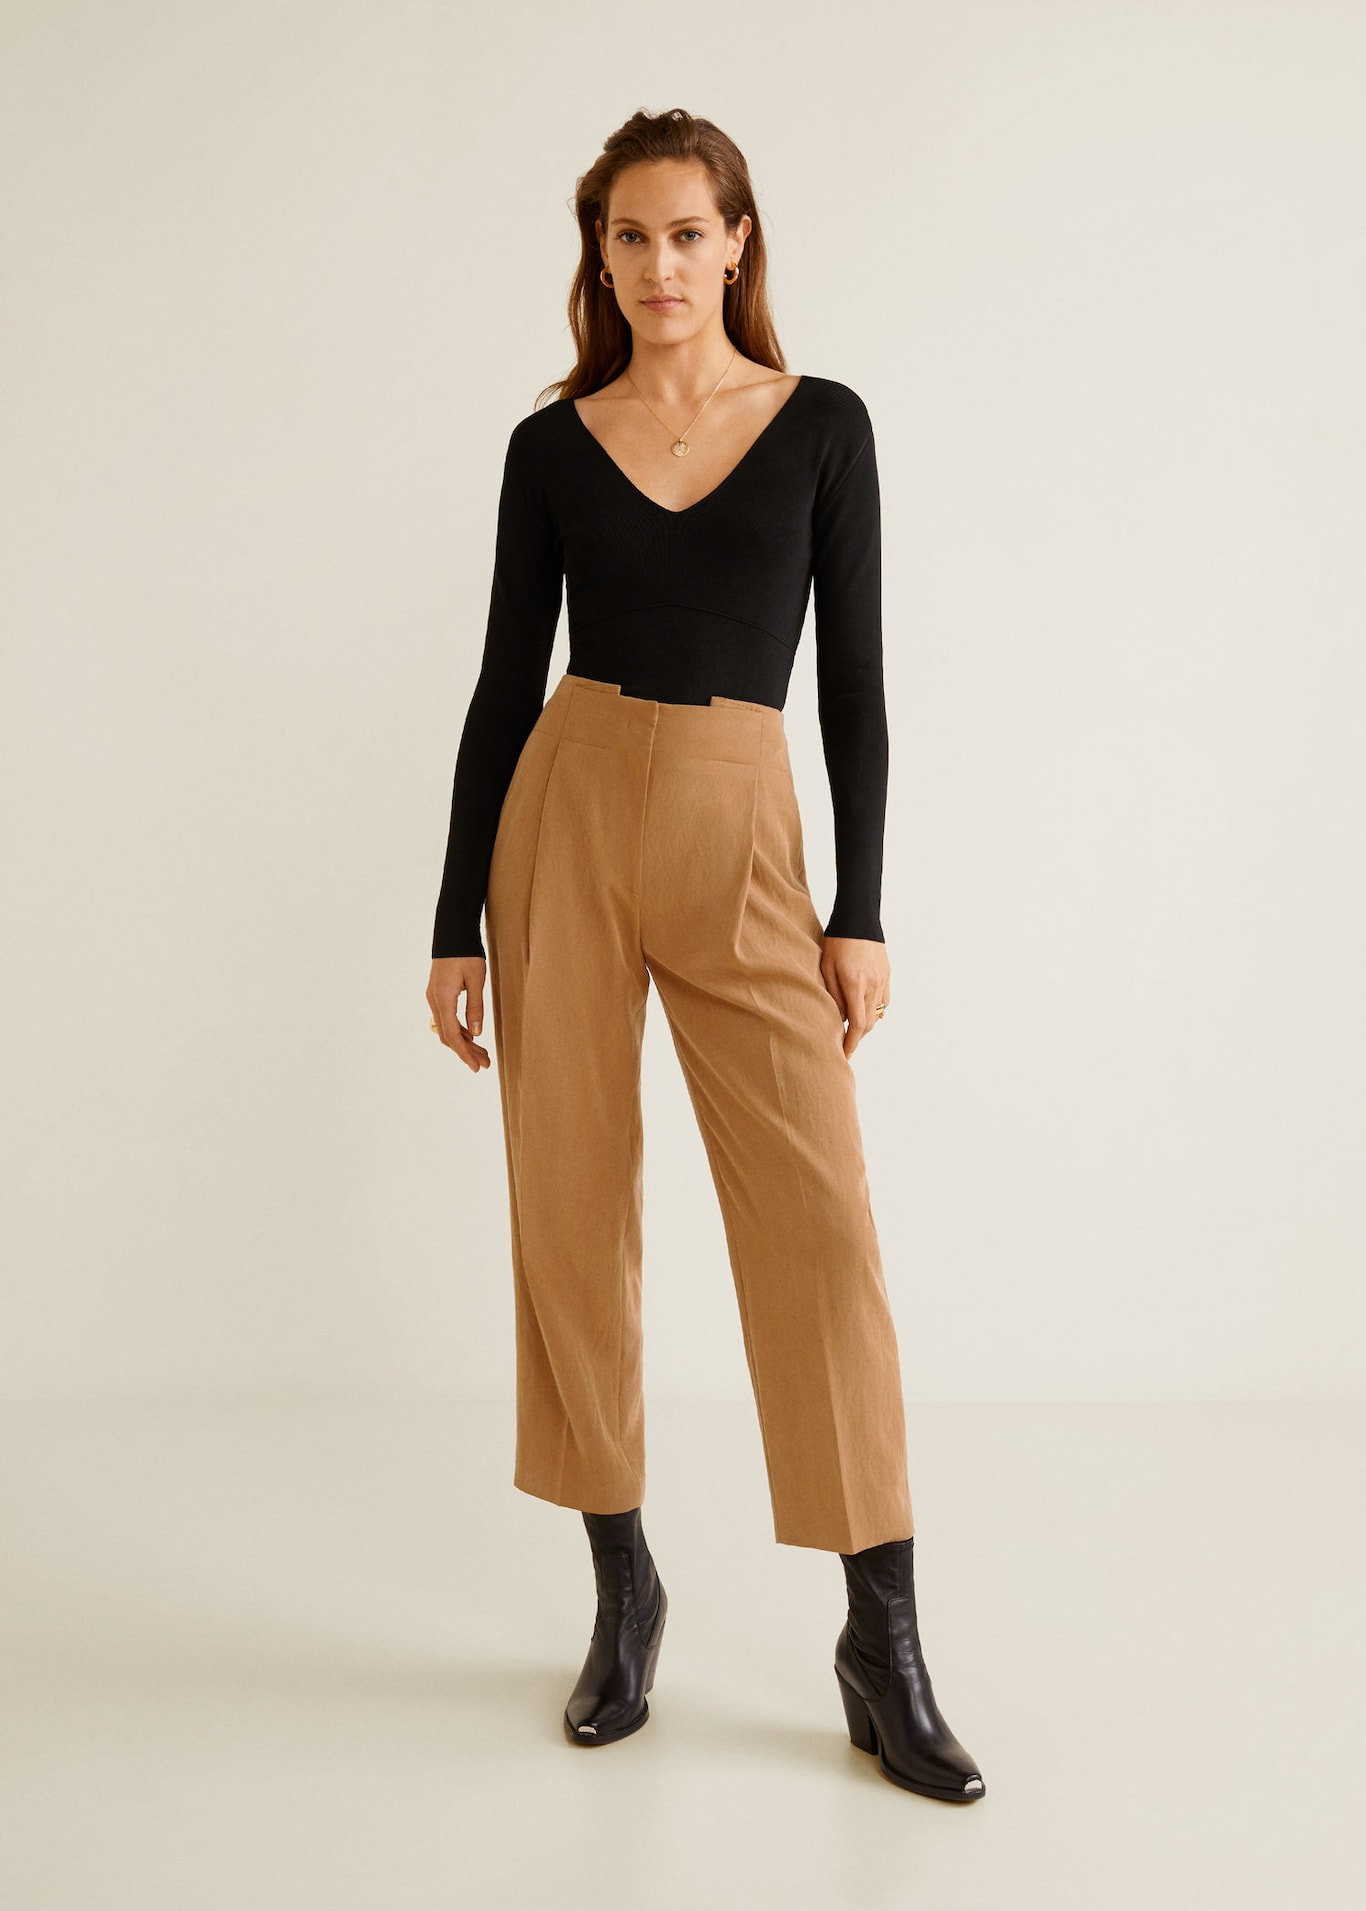 Decorative Pleat Pants, $80, Mango